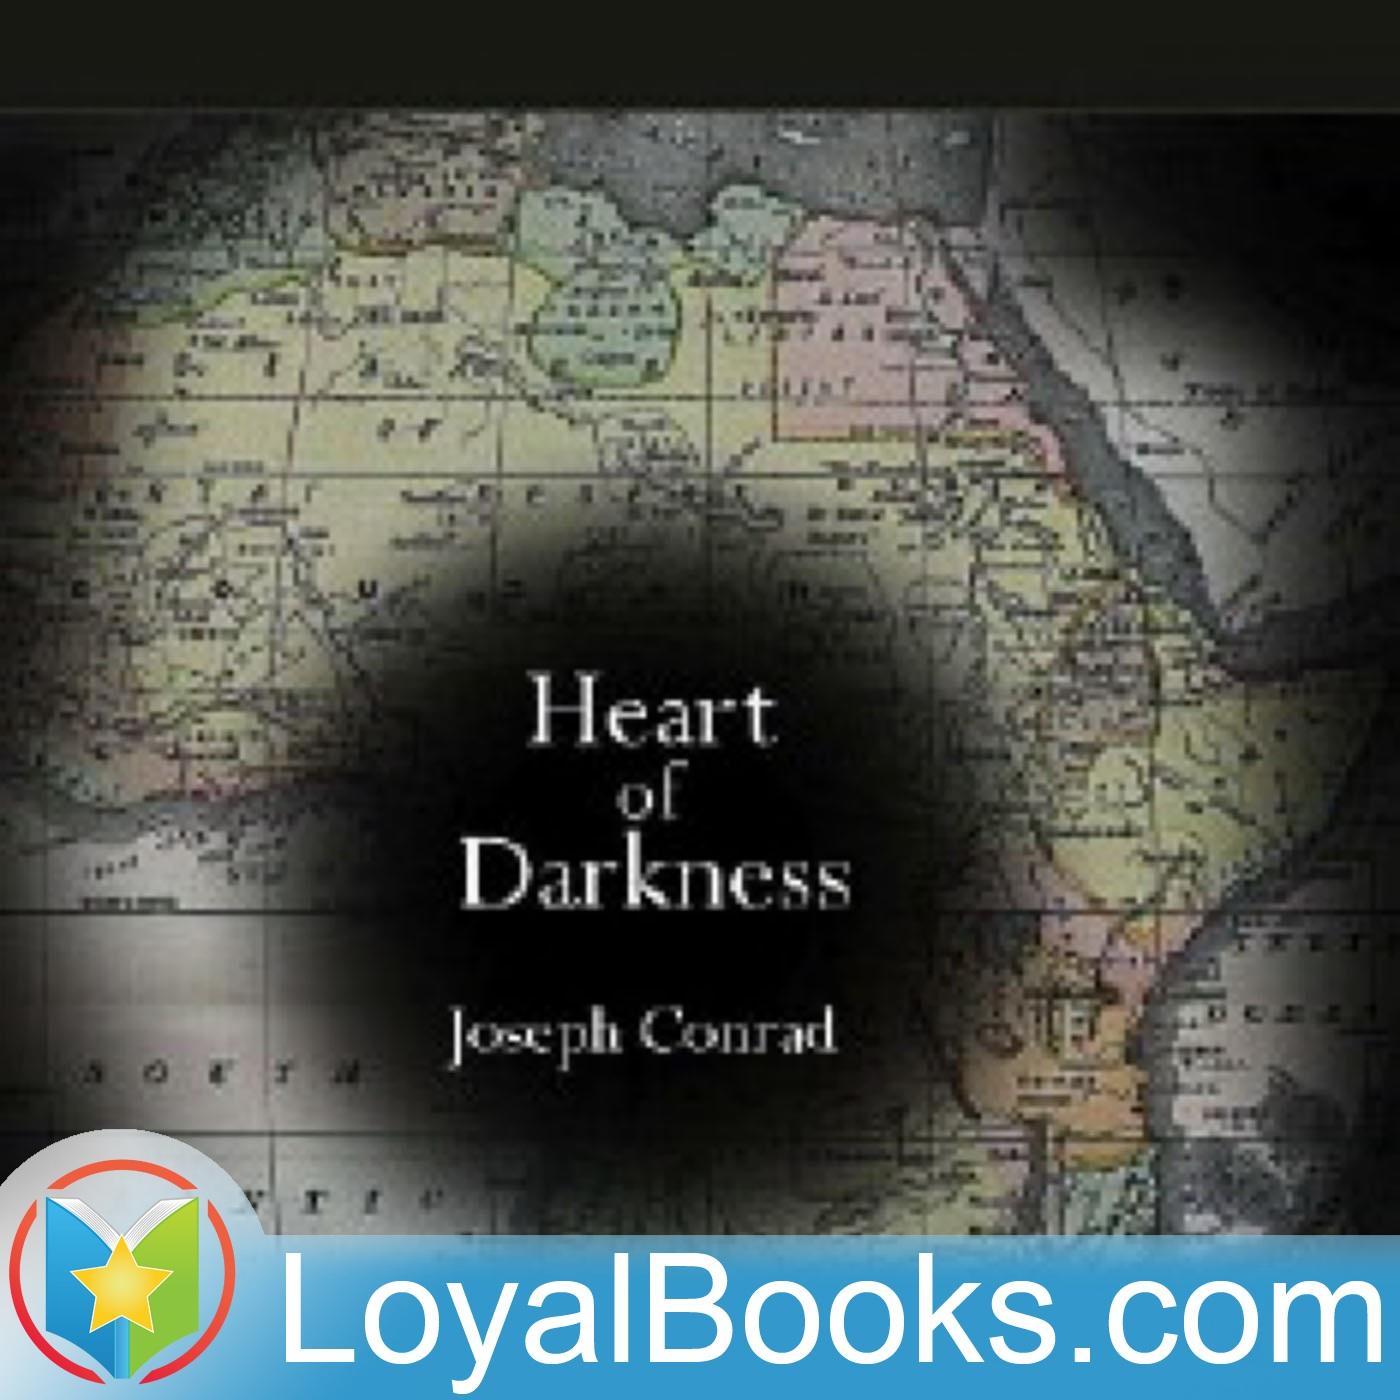 <![CDATA[Heart of Darkness by Joseph Conrad]]>